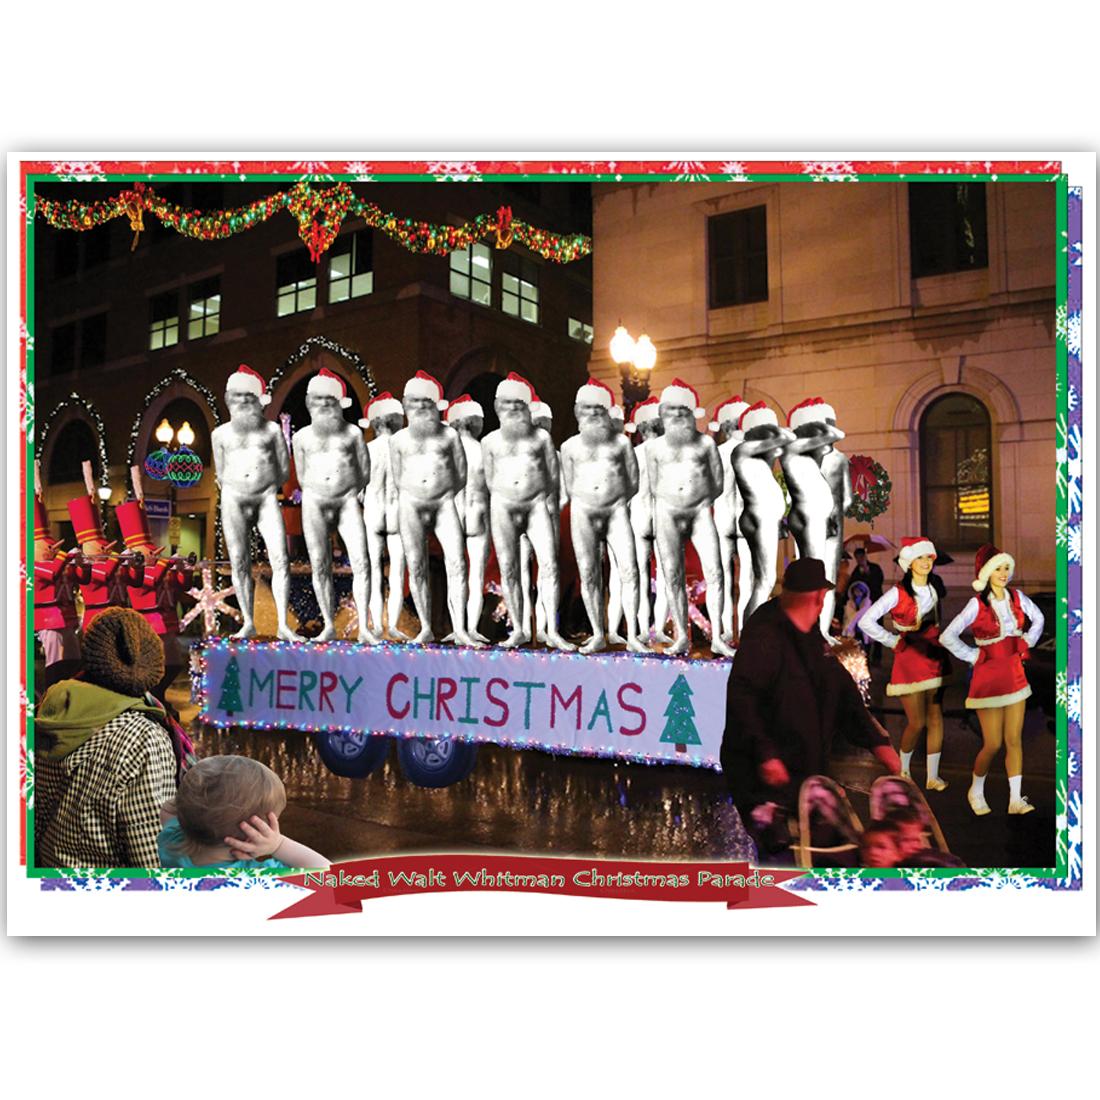 Naked Walt Whitman Christmas Parade